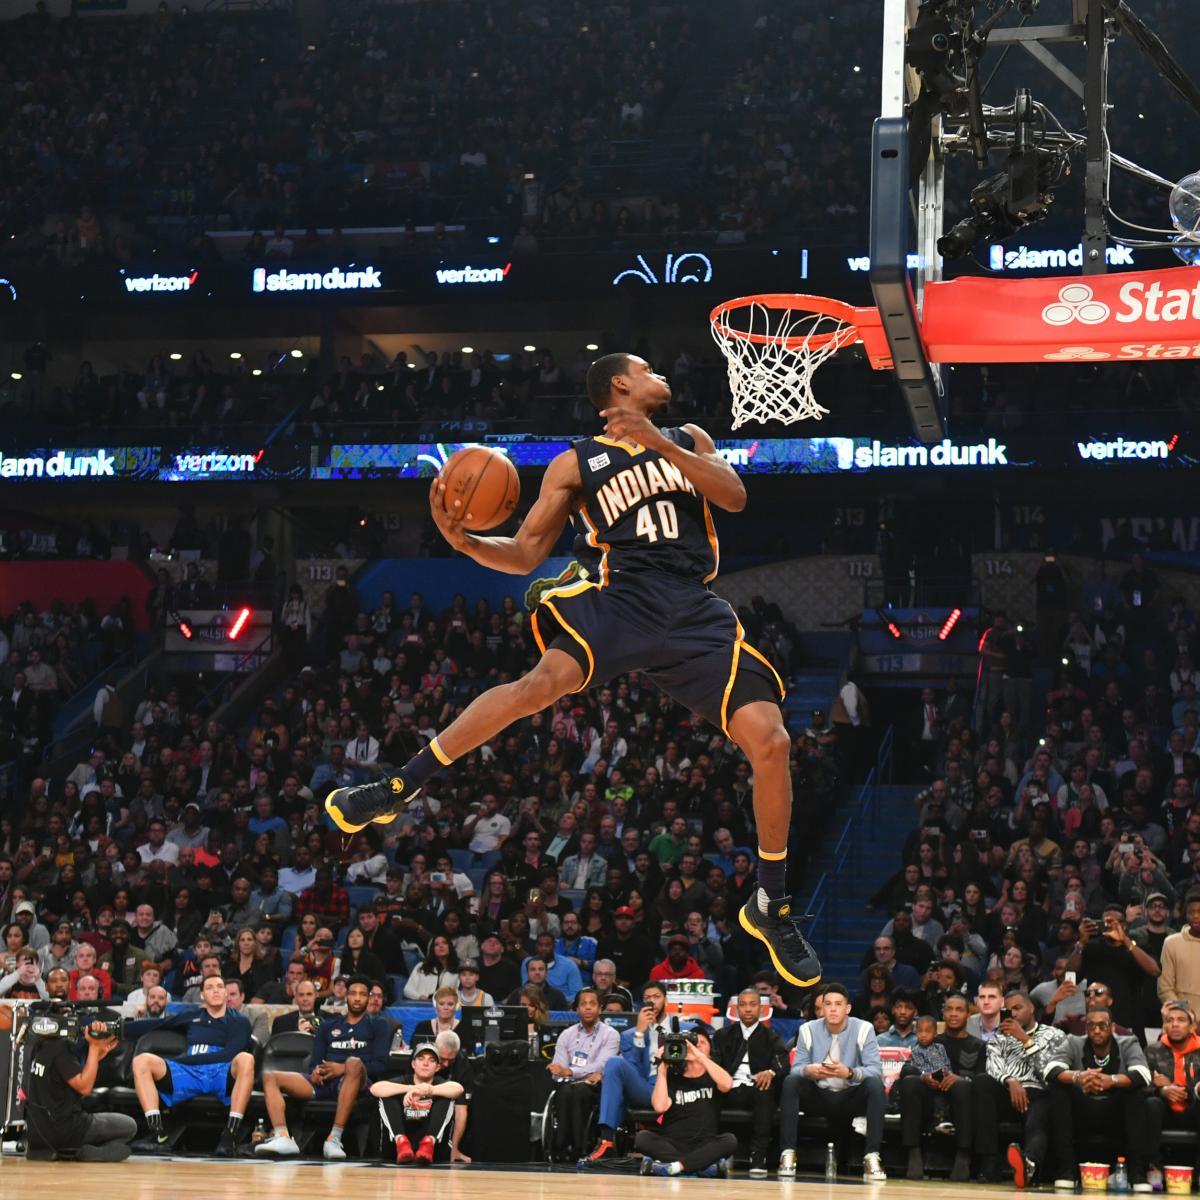 Dunk Contest 2017: NBA Slam Dunk Contest 2017: Winner, Highlights, Scores And